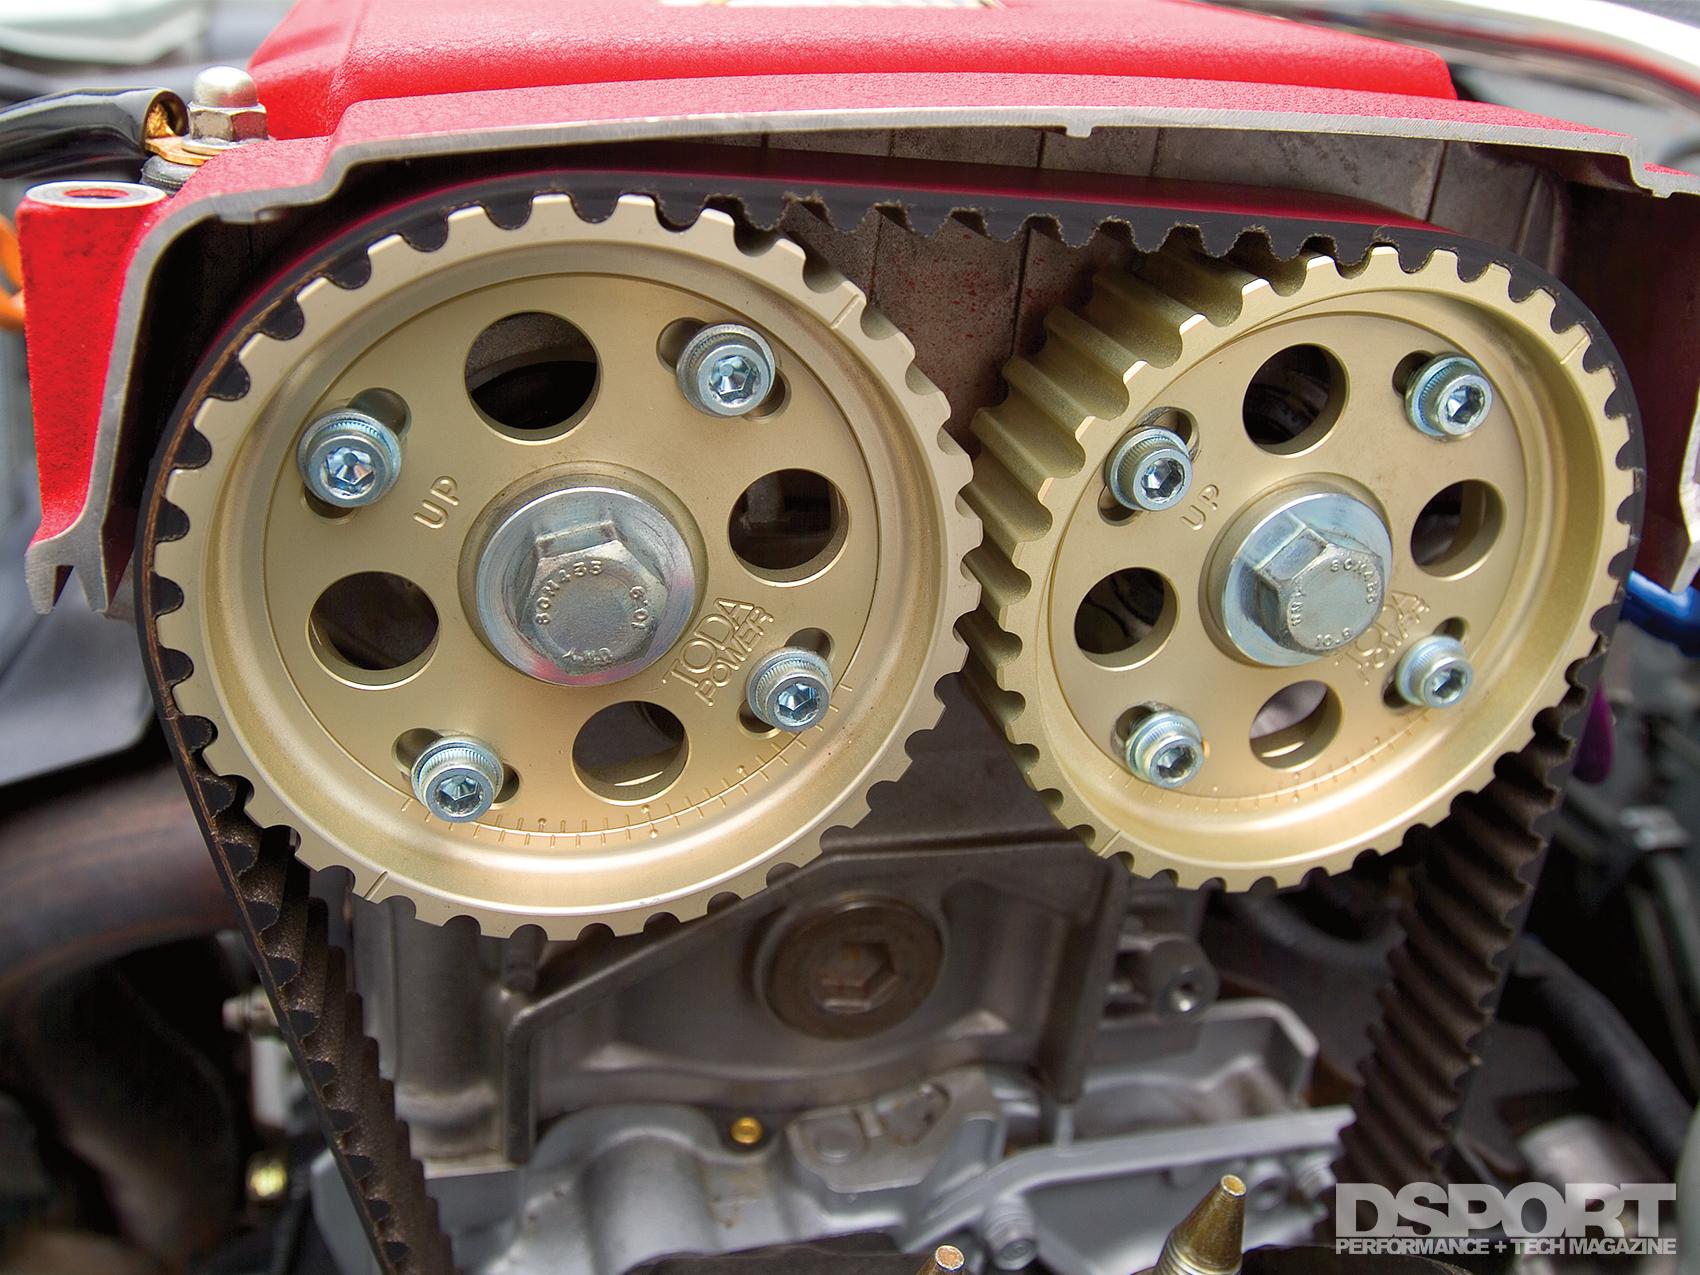 Resurrected 1999 Honda Civic CX Type R